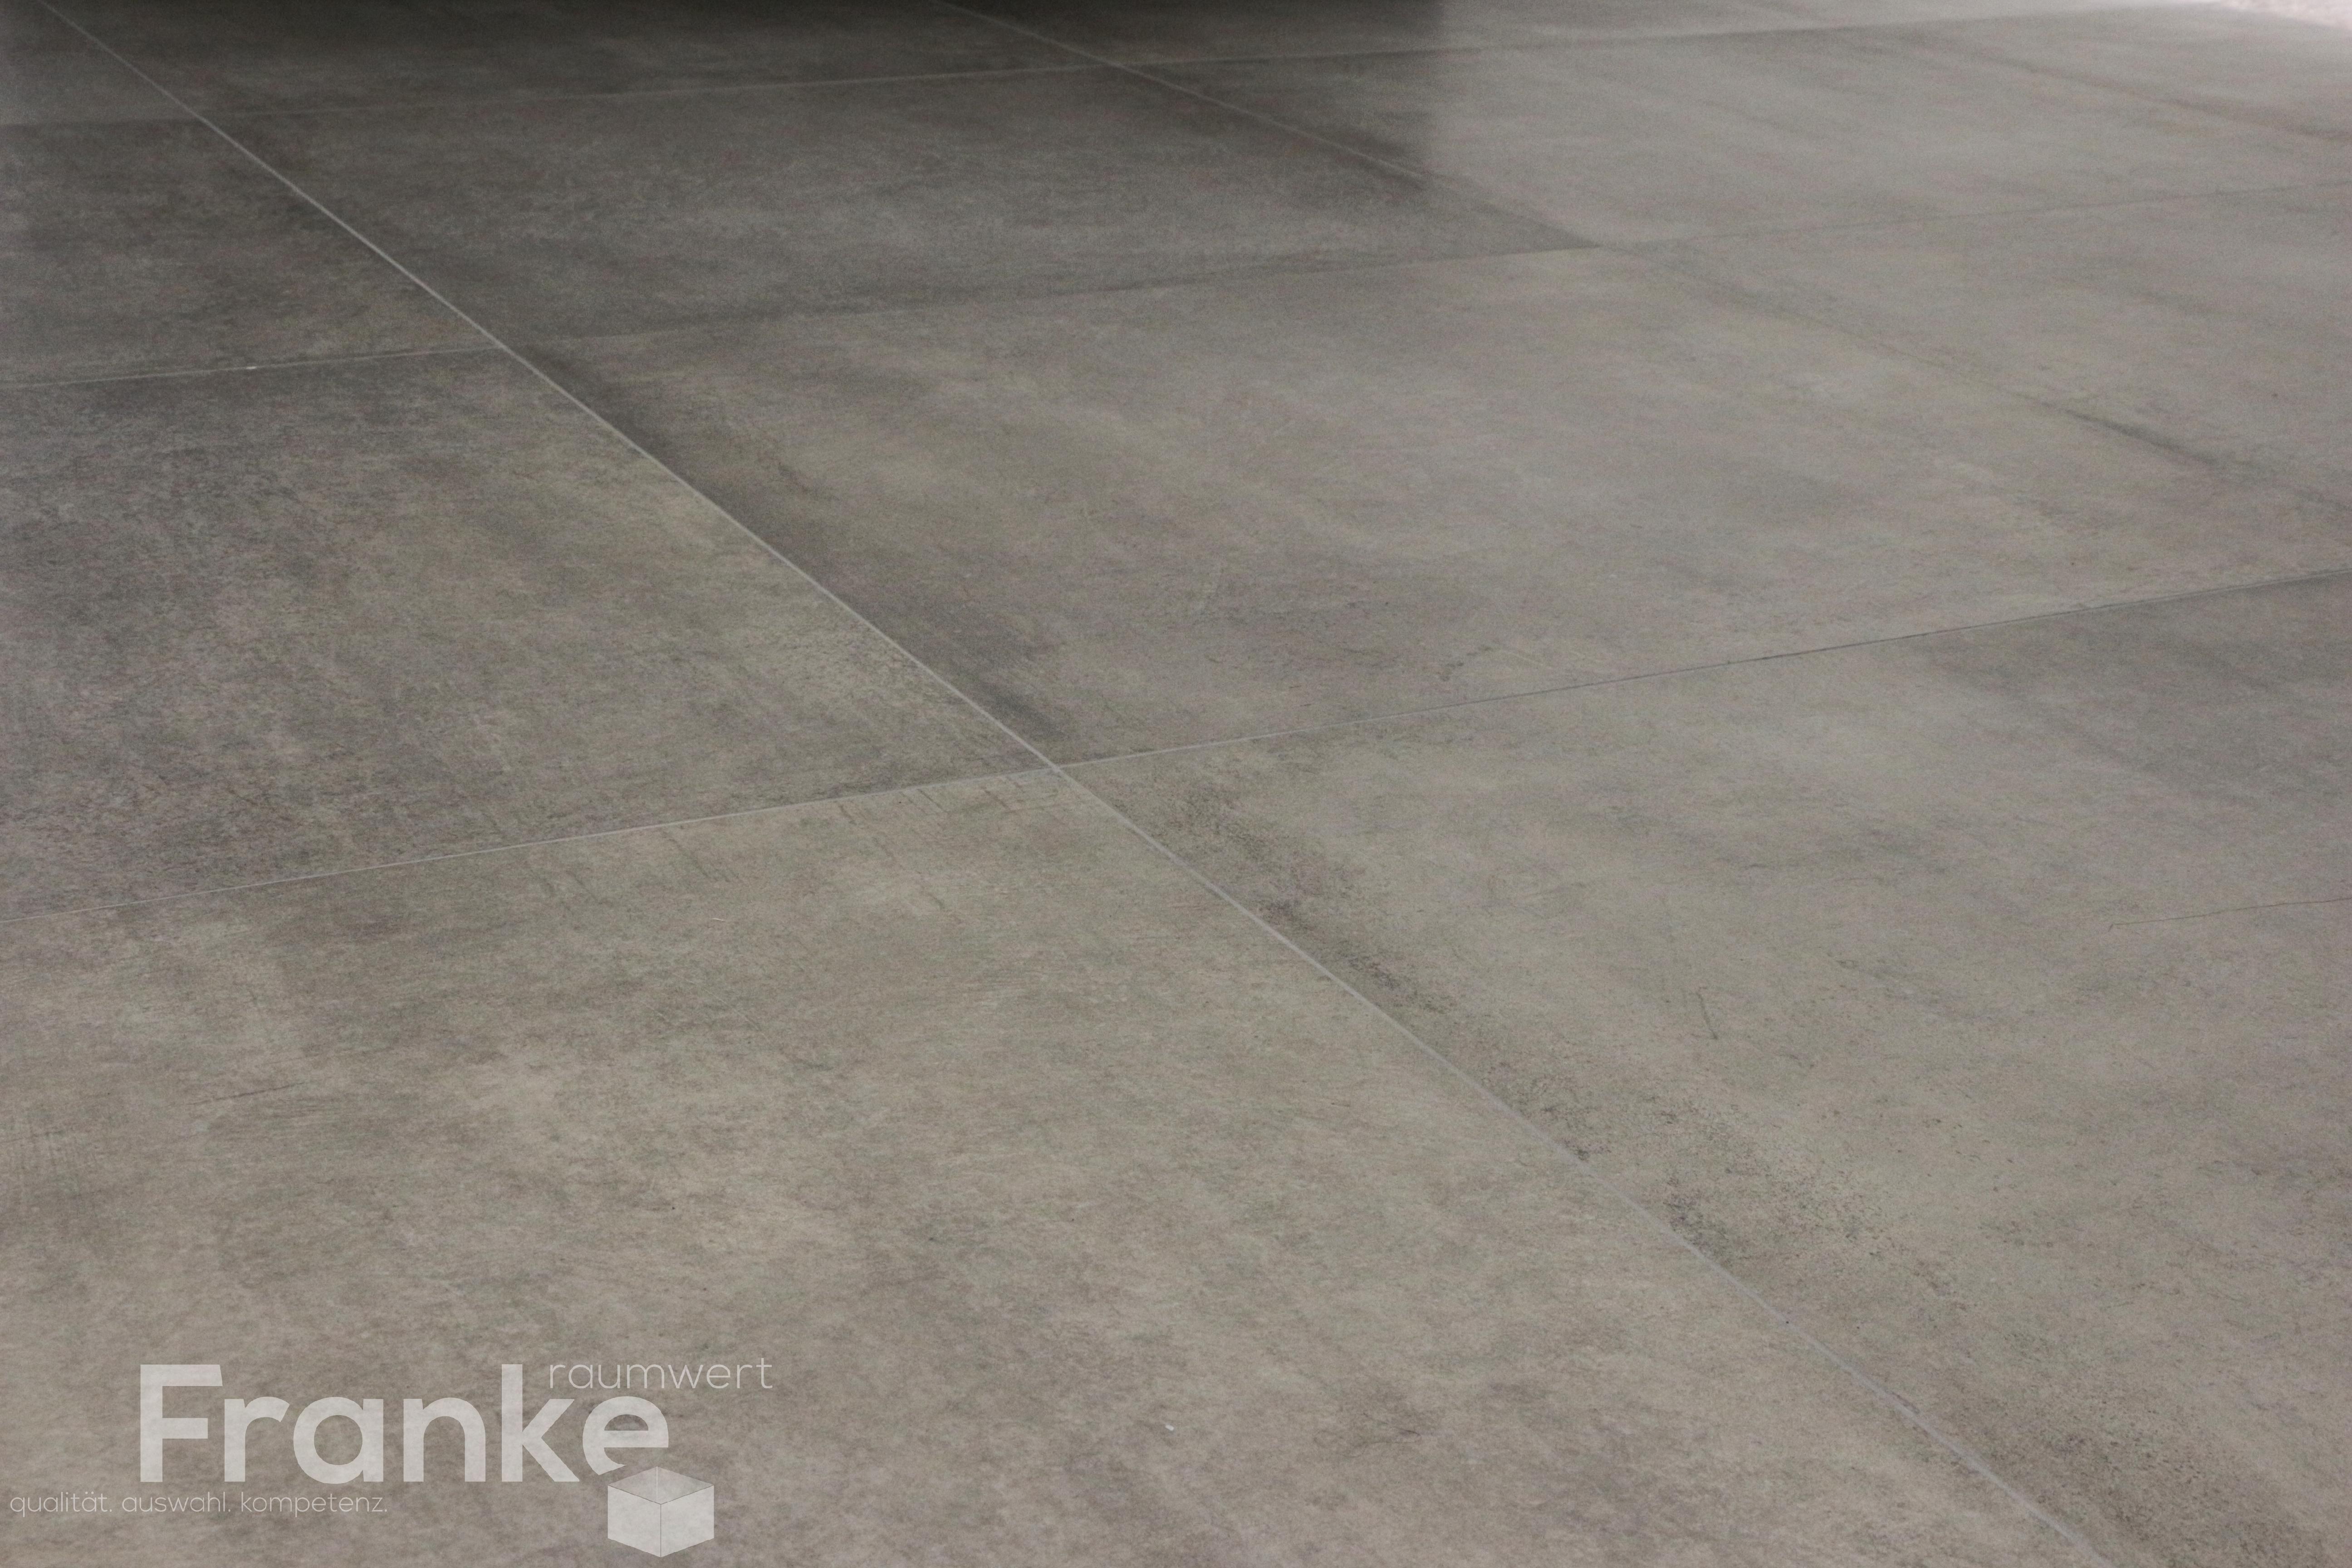 Bodenfliese Im Großformat X Cm Im Betonlook Httpwwwfranke - Fliesen grossformat shop